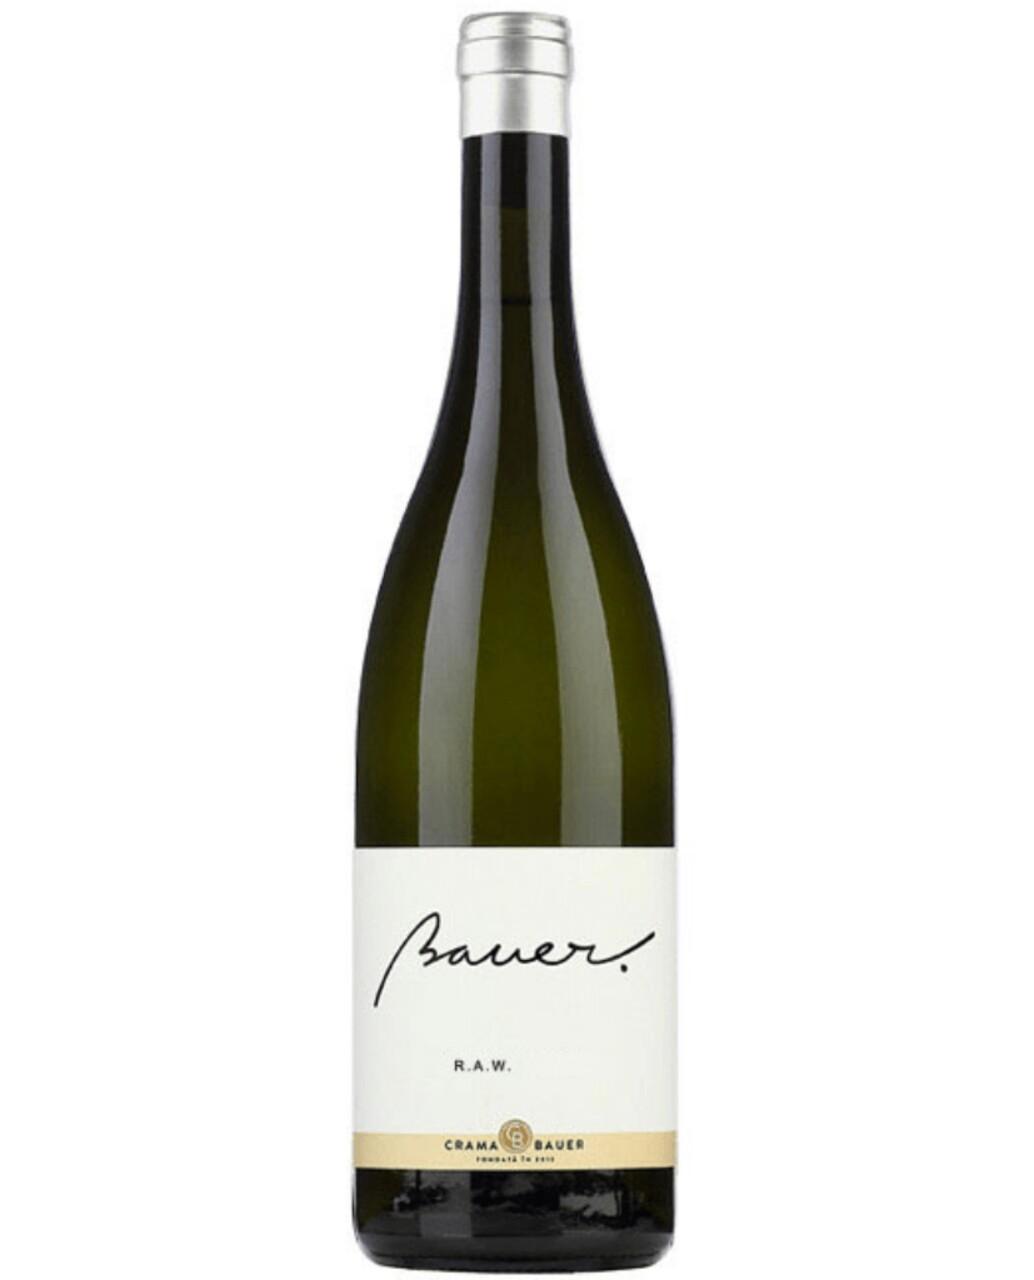 Bauer R.A.W. Sauvignon Blanc